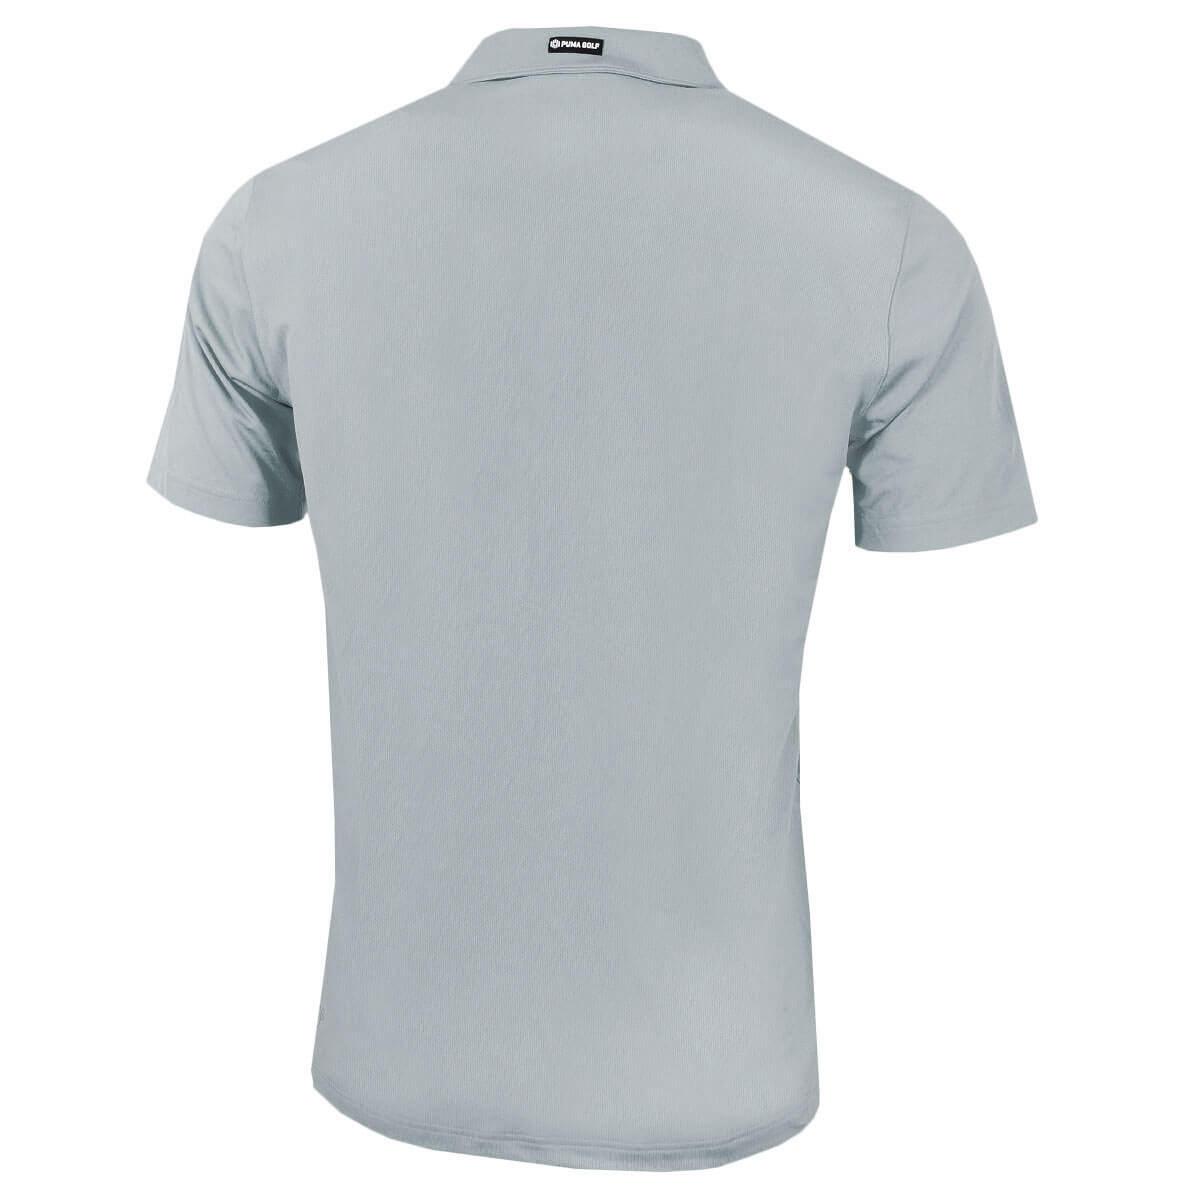 Puma-Golf-Mens-Essential-Pounce-Cresting-DryCell-Tech-Polo-Shirt-46-OFF-RRP thumbnail 26